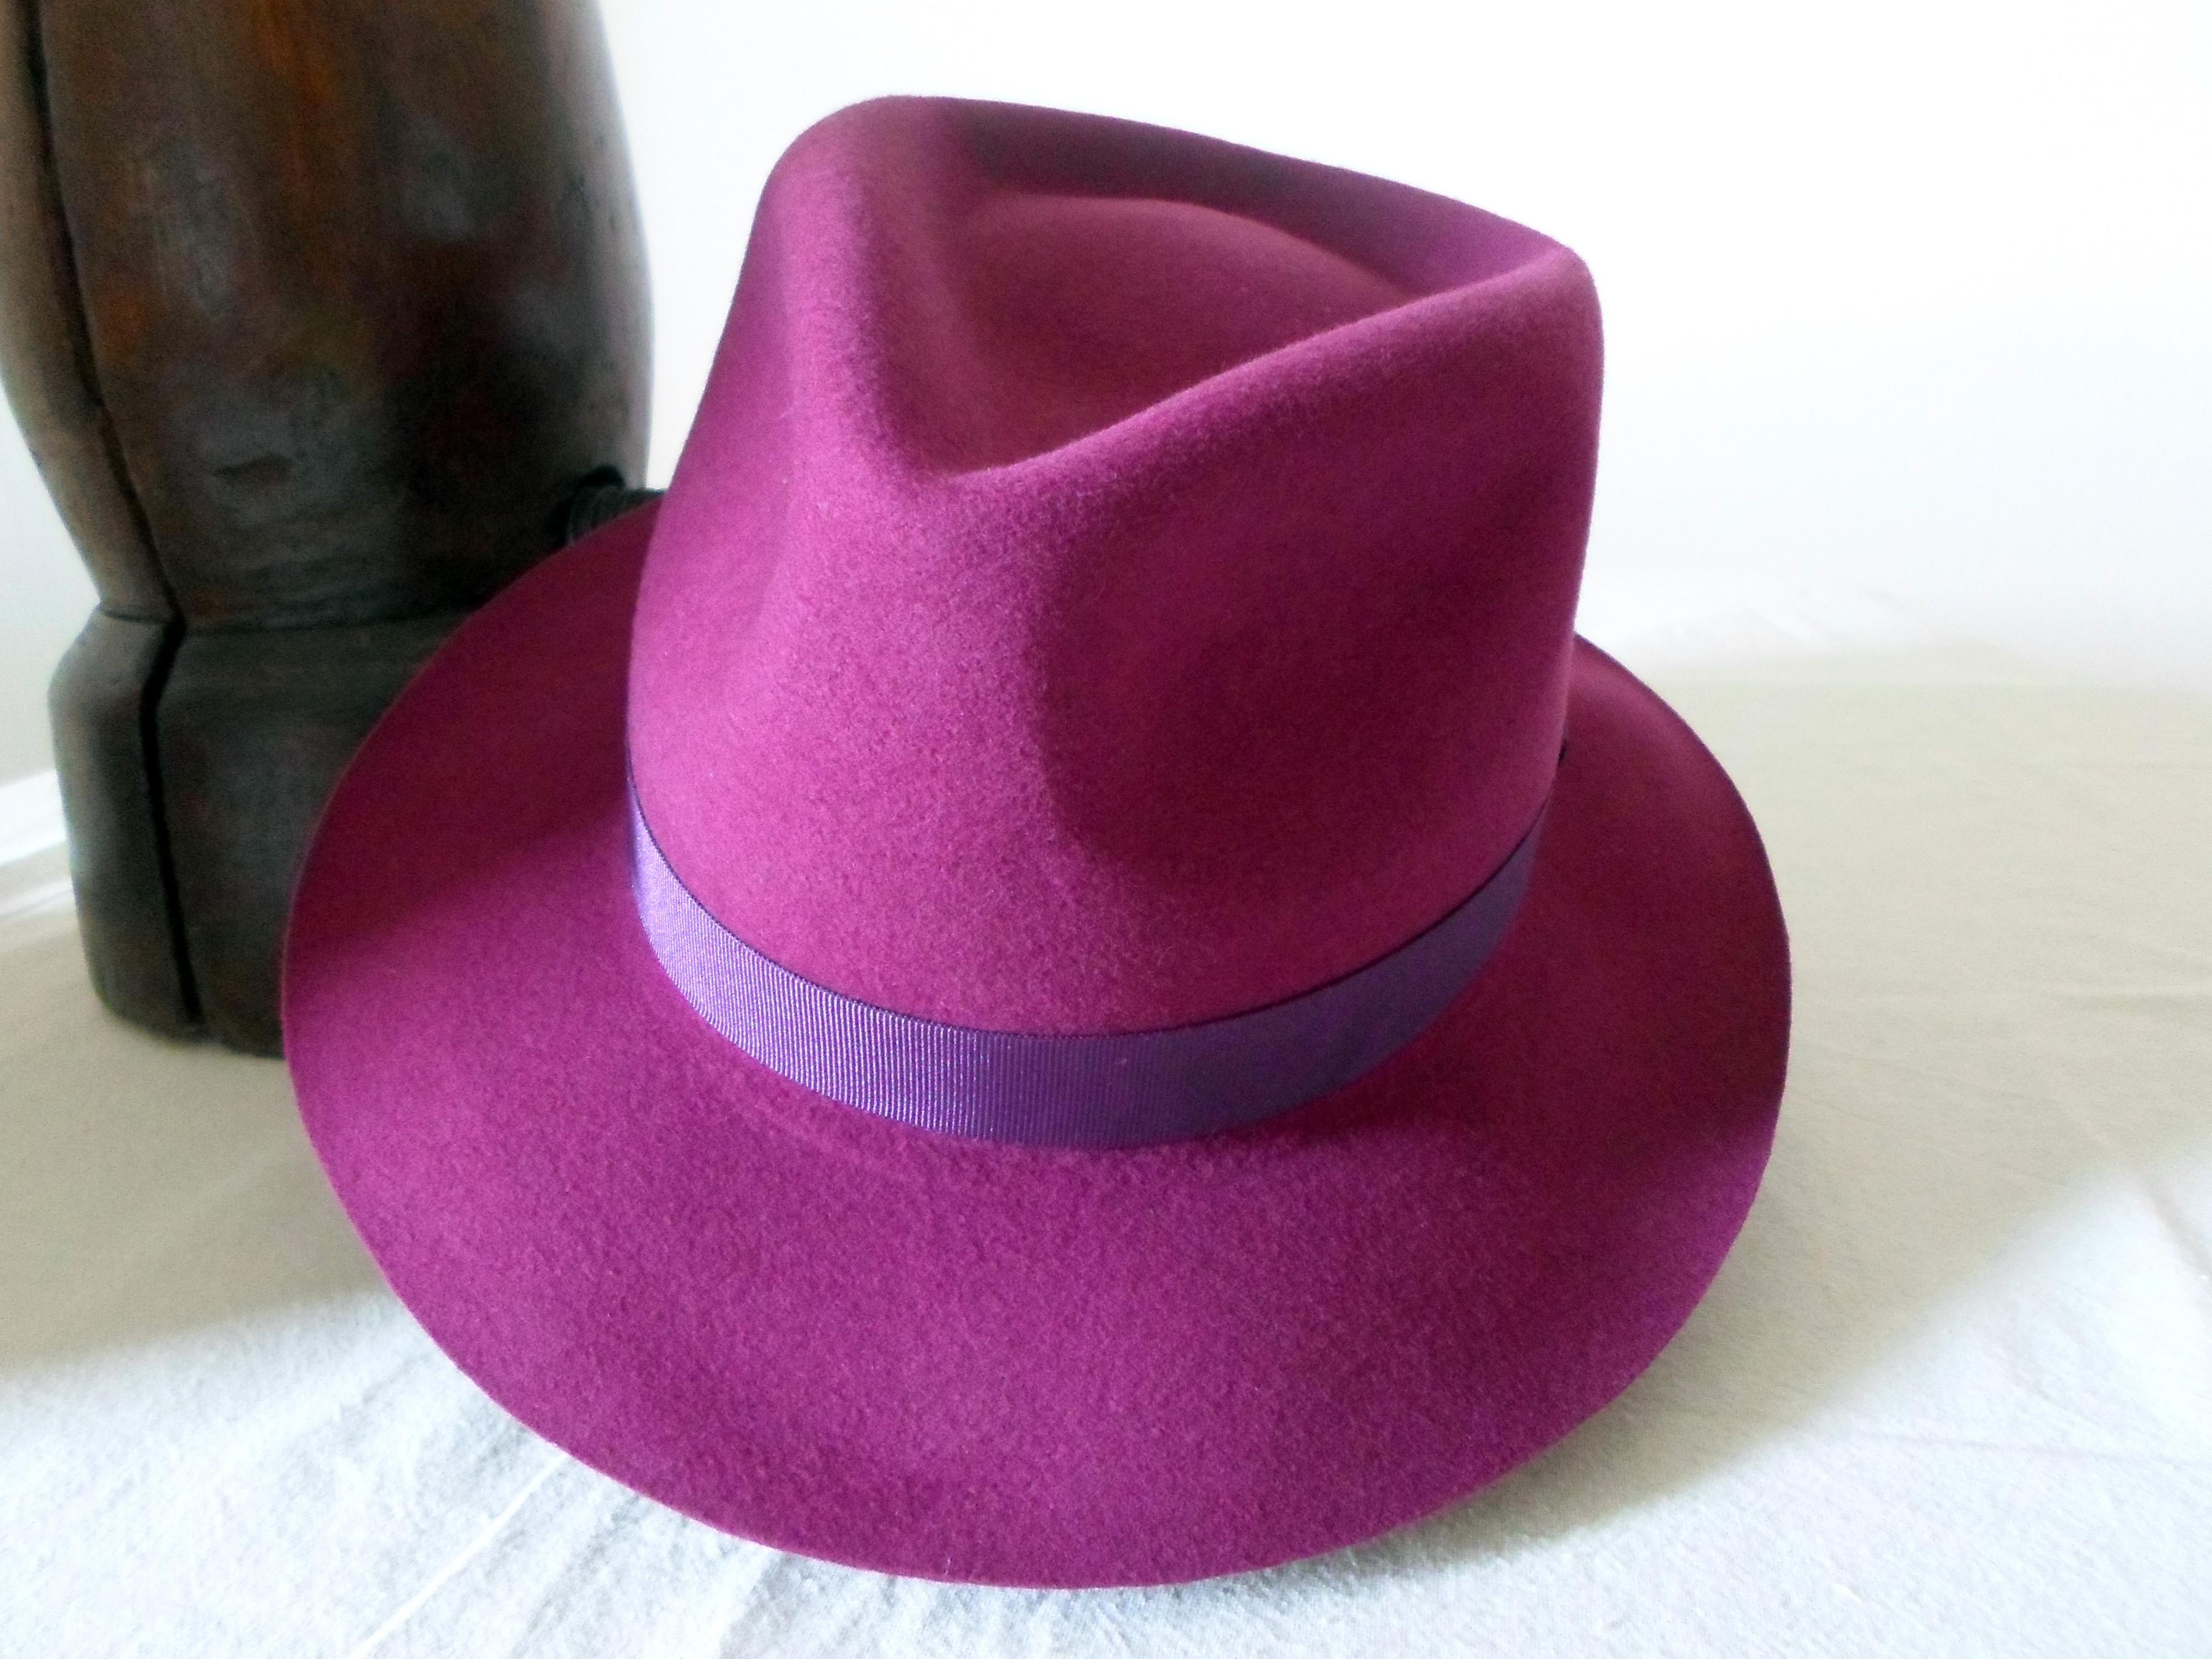 Burgundy Wine Pink Wool Felt Fedora - Wide Brim Merino Wool Felt ... e856a625b40